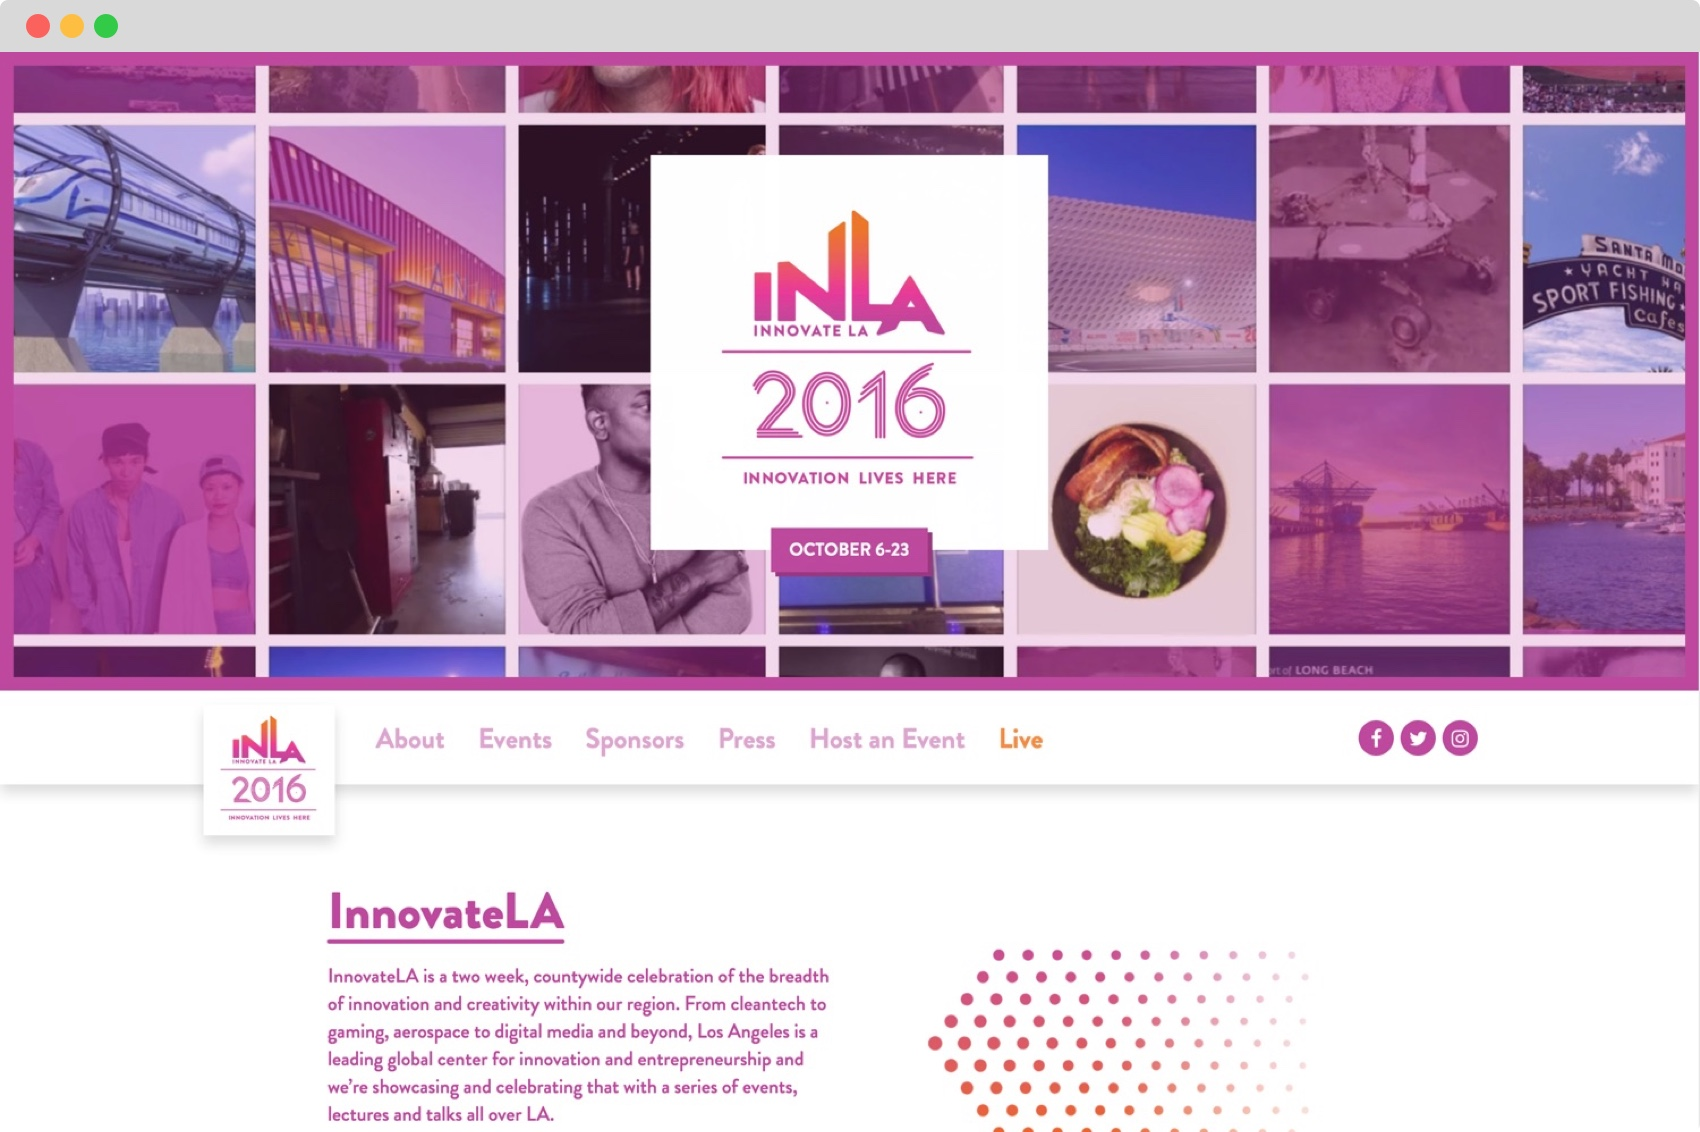 ila_homepage.jpg